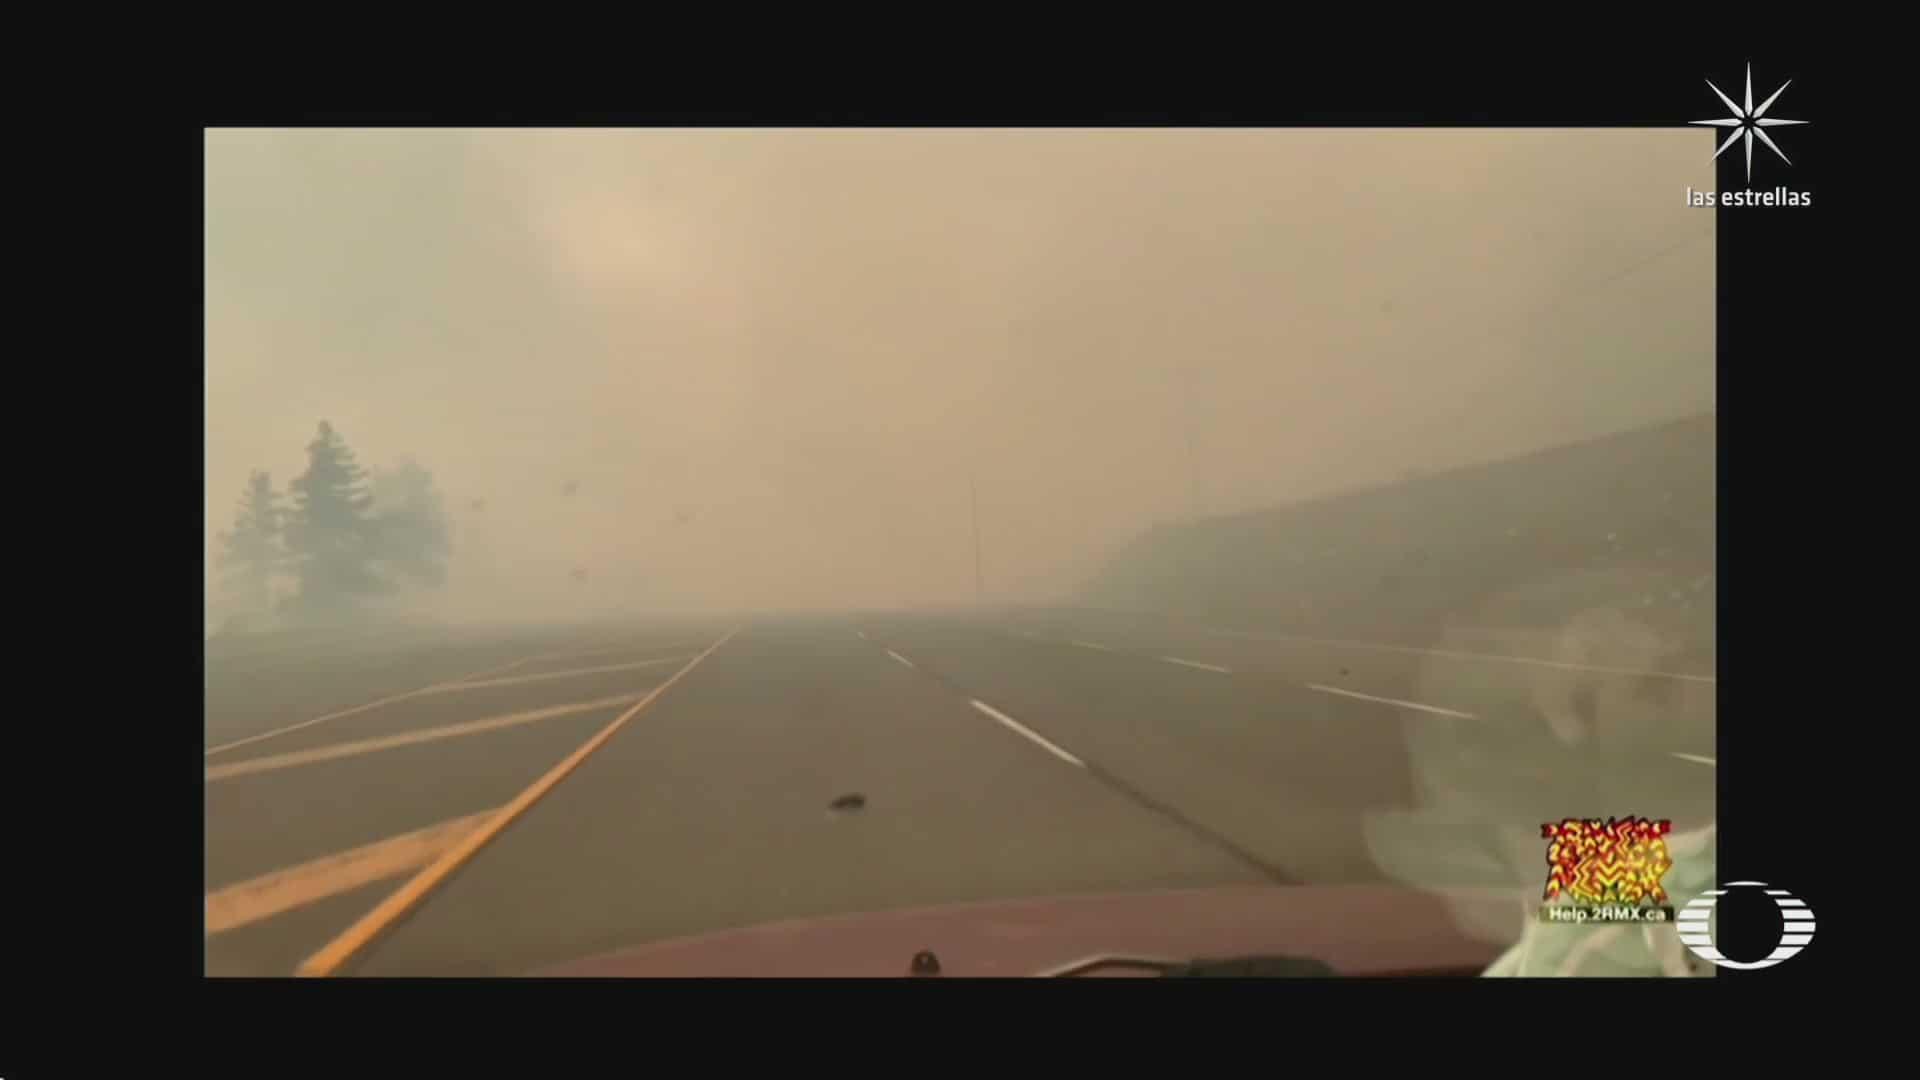 incendio forestal en canada agrava ola de calor